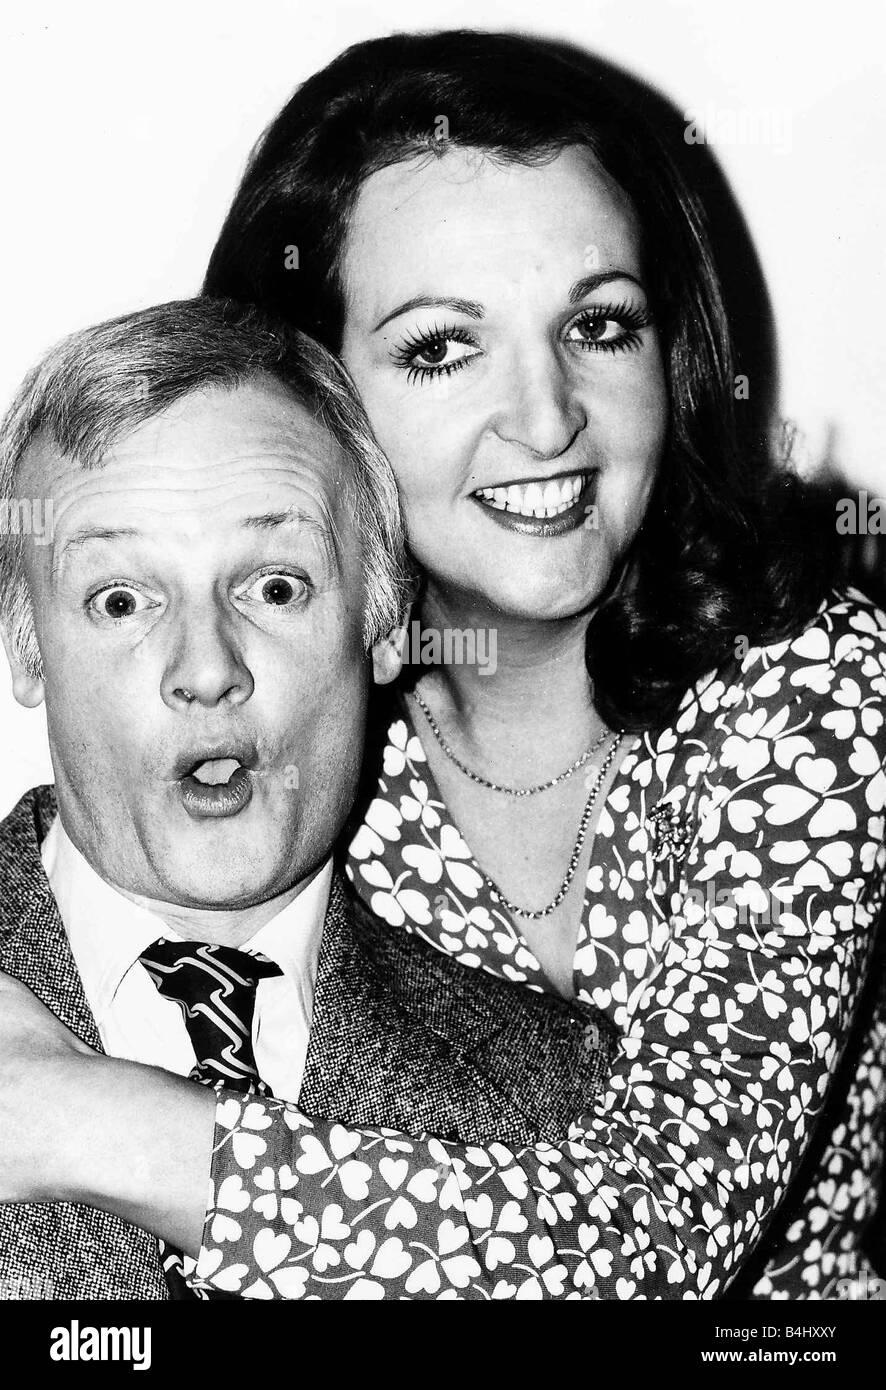 Penelope Keith with John Inman February 1977 dbase msi - Stock Image